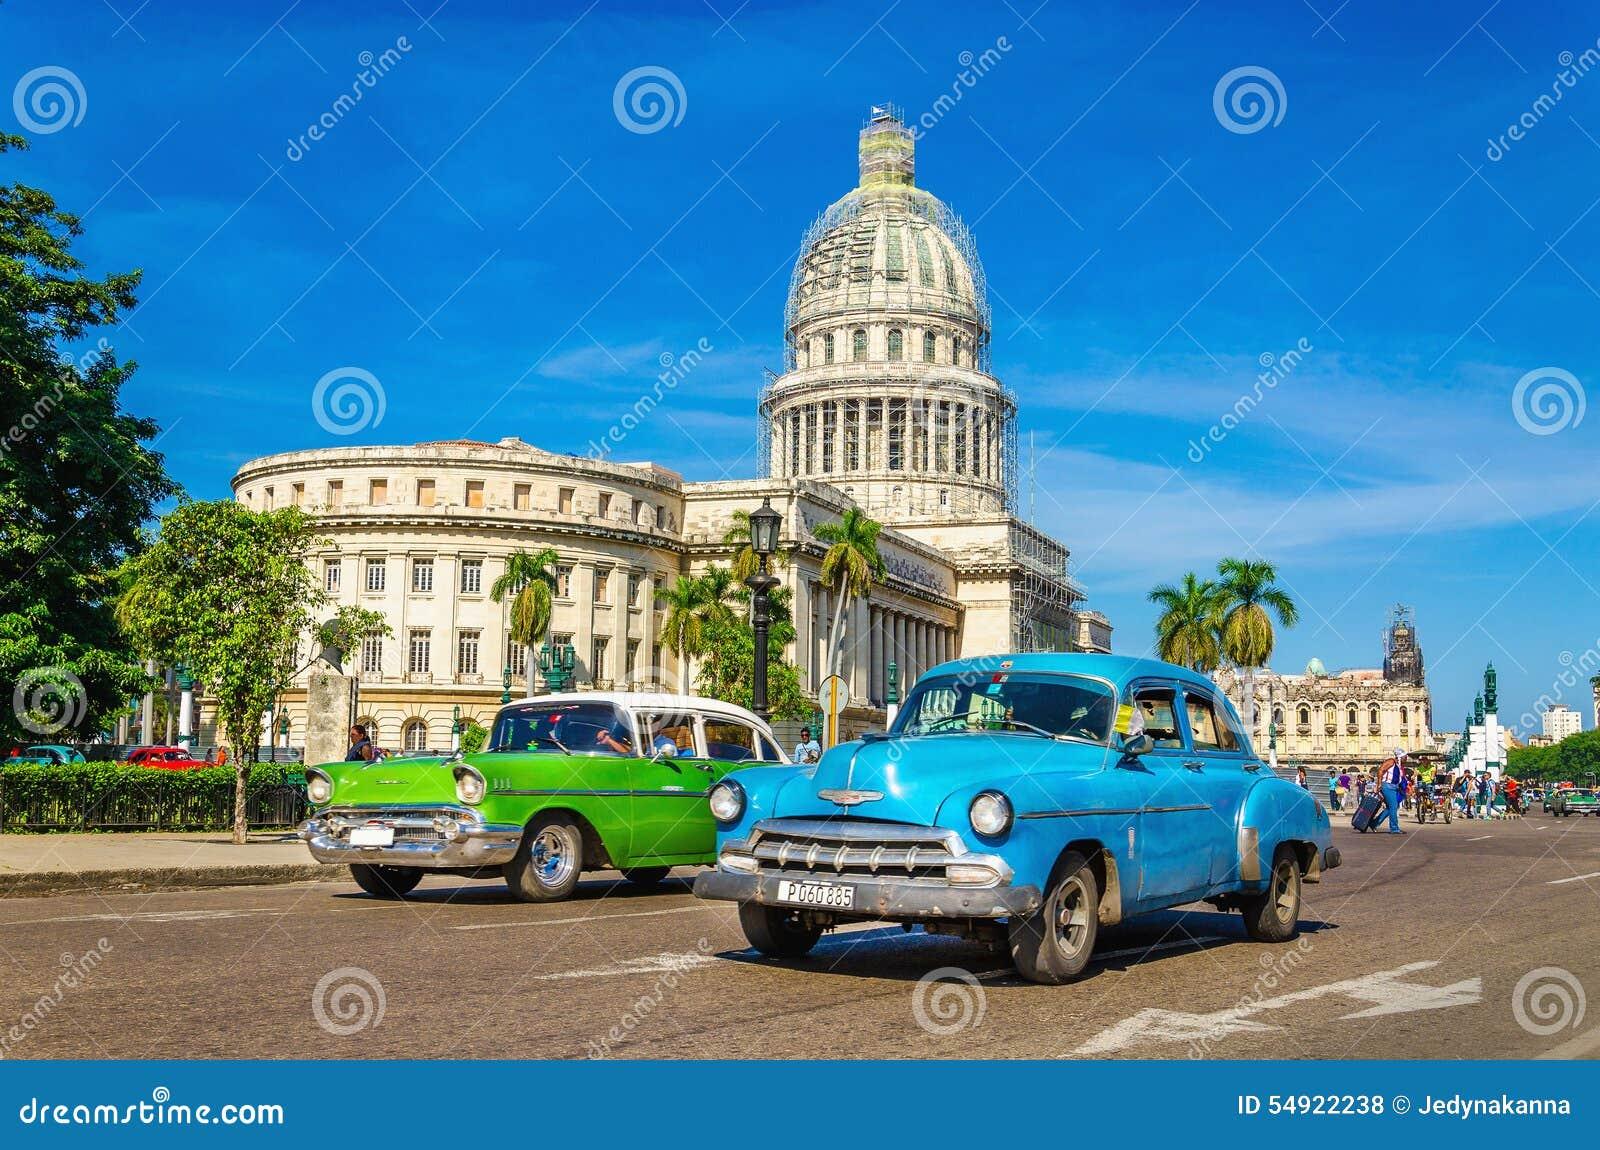 Classic American Cars And Capitol In Havana, Cuba Editorial Stock ...